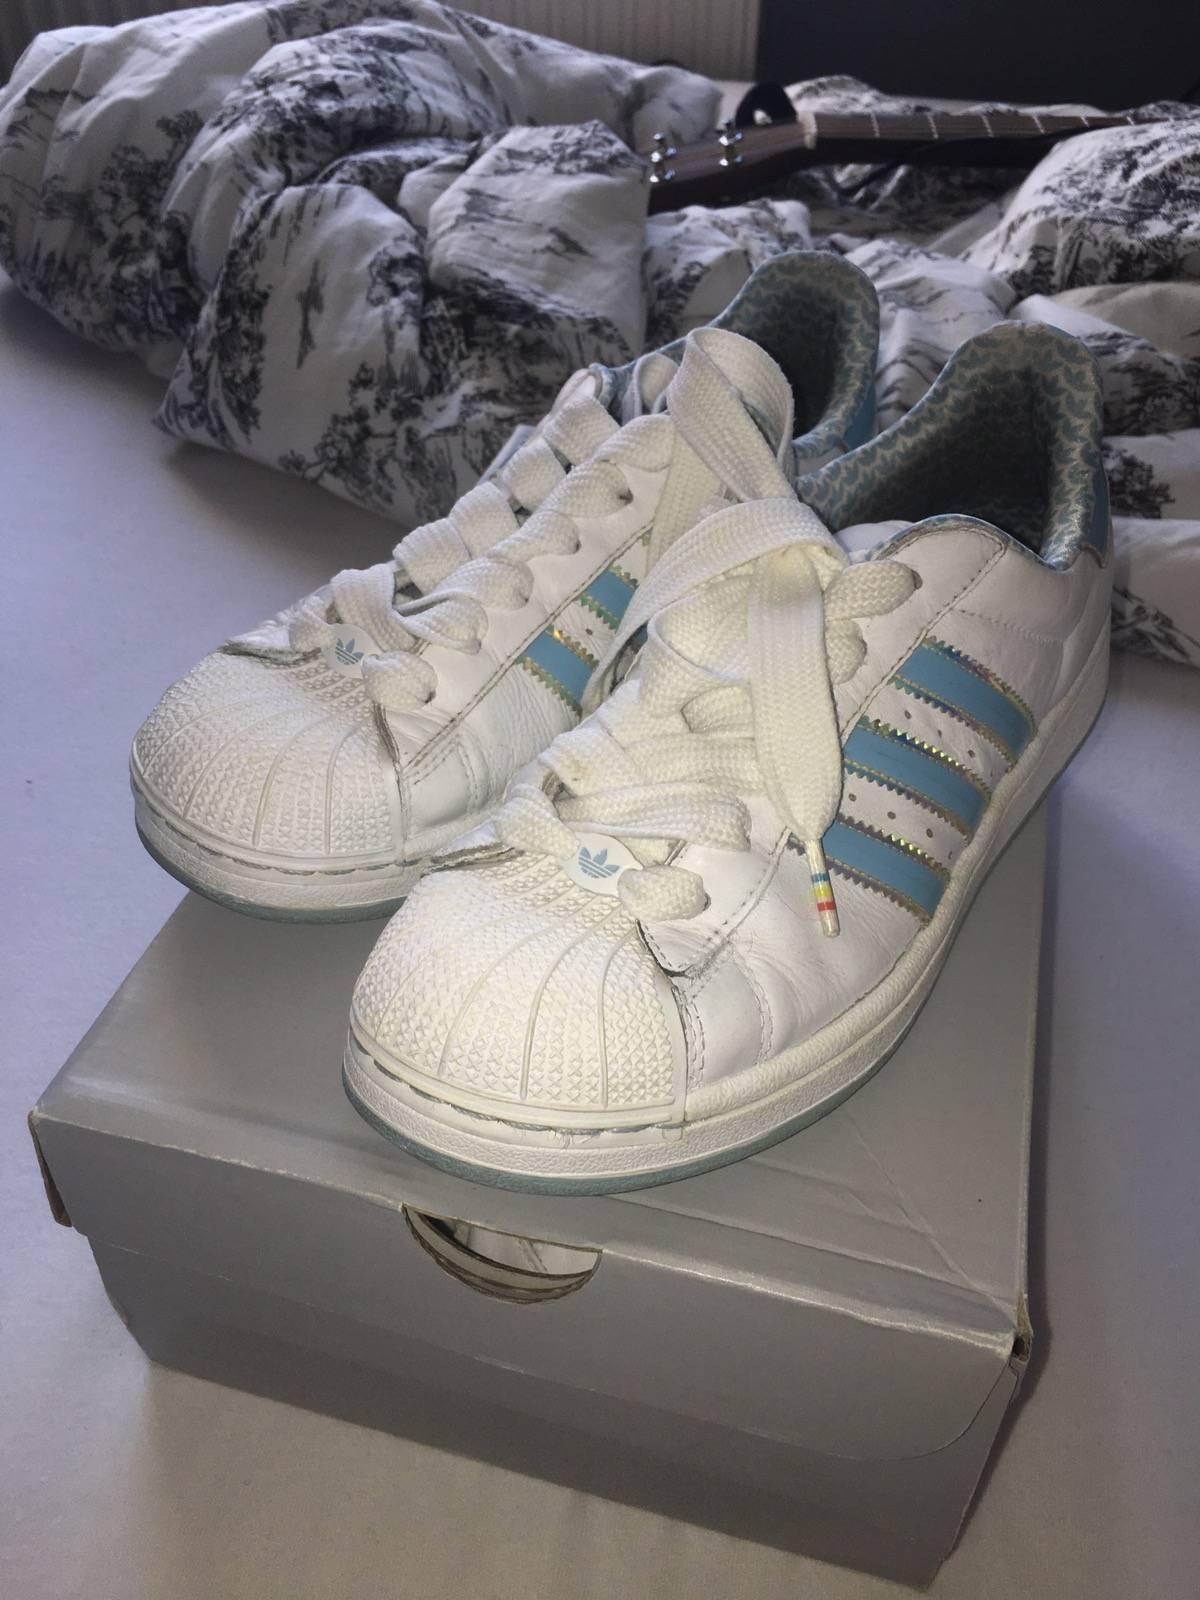 Adidas ADIDAS SUPERSTAR 2.0 912846 holo baby blue